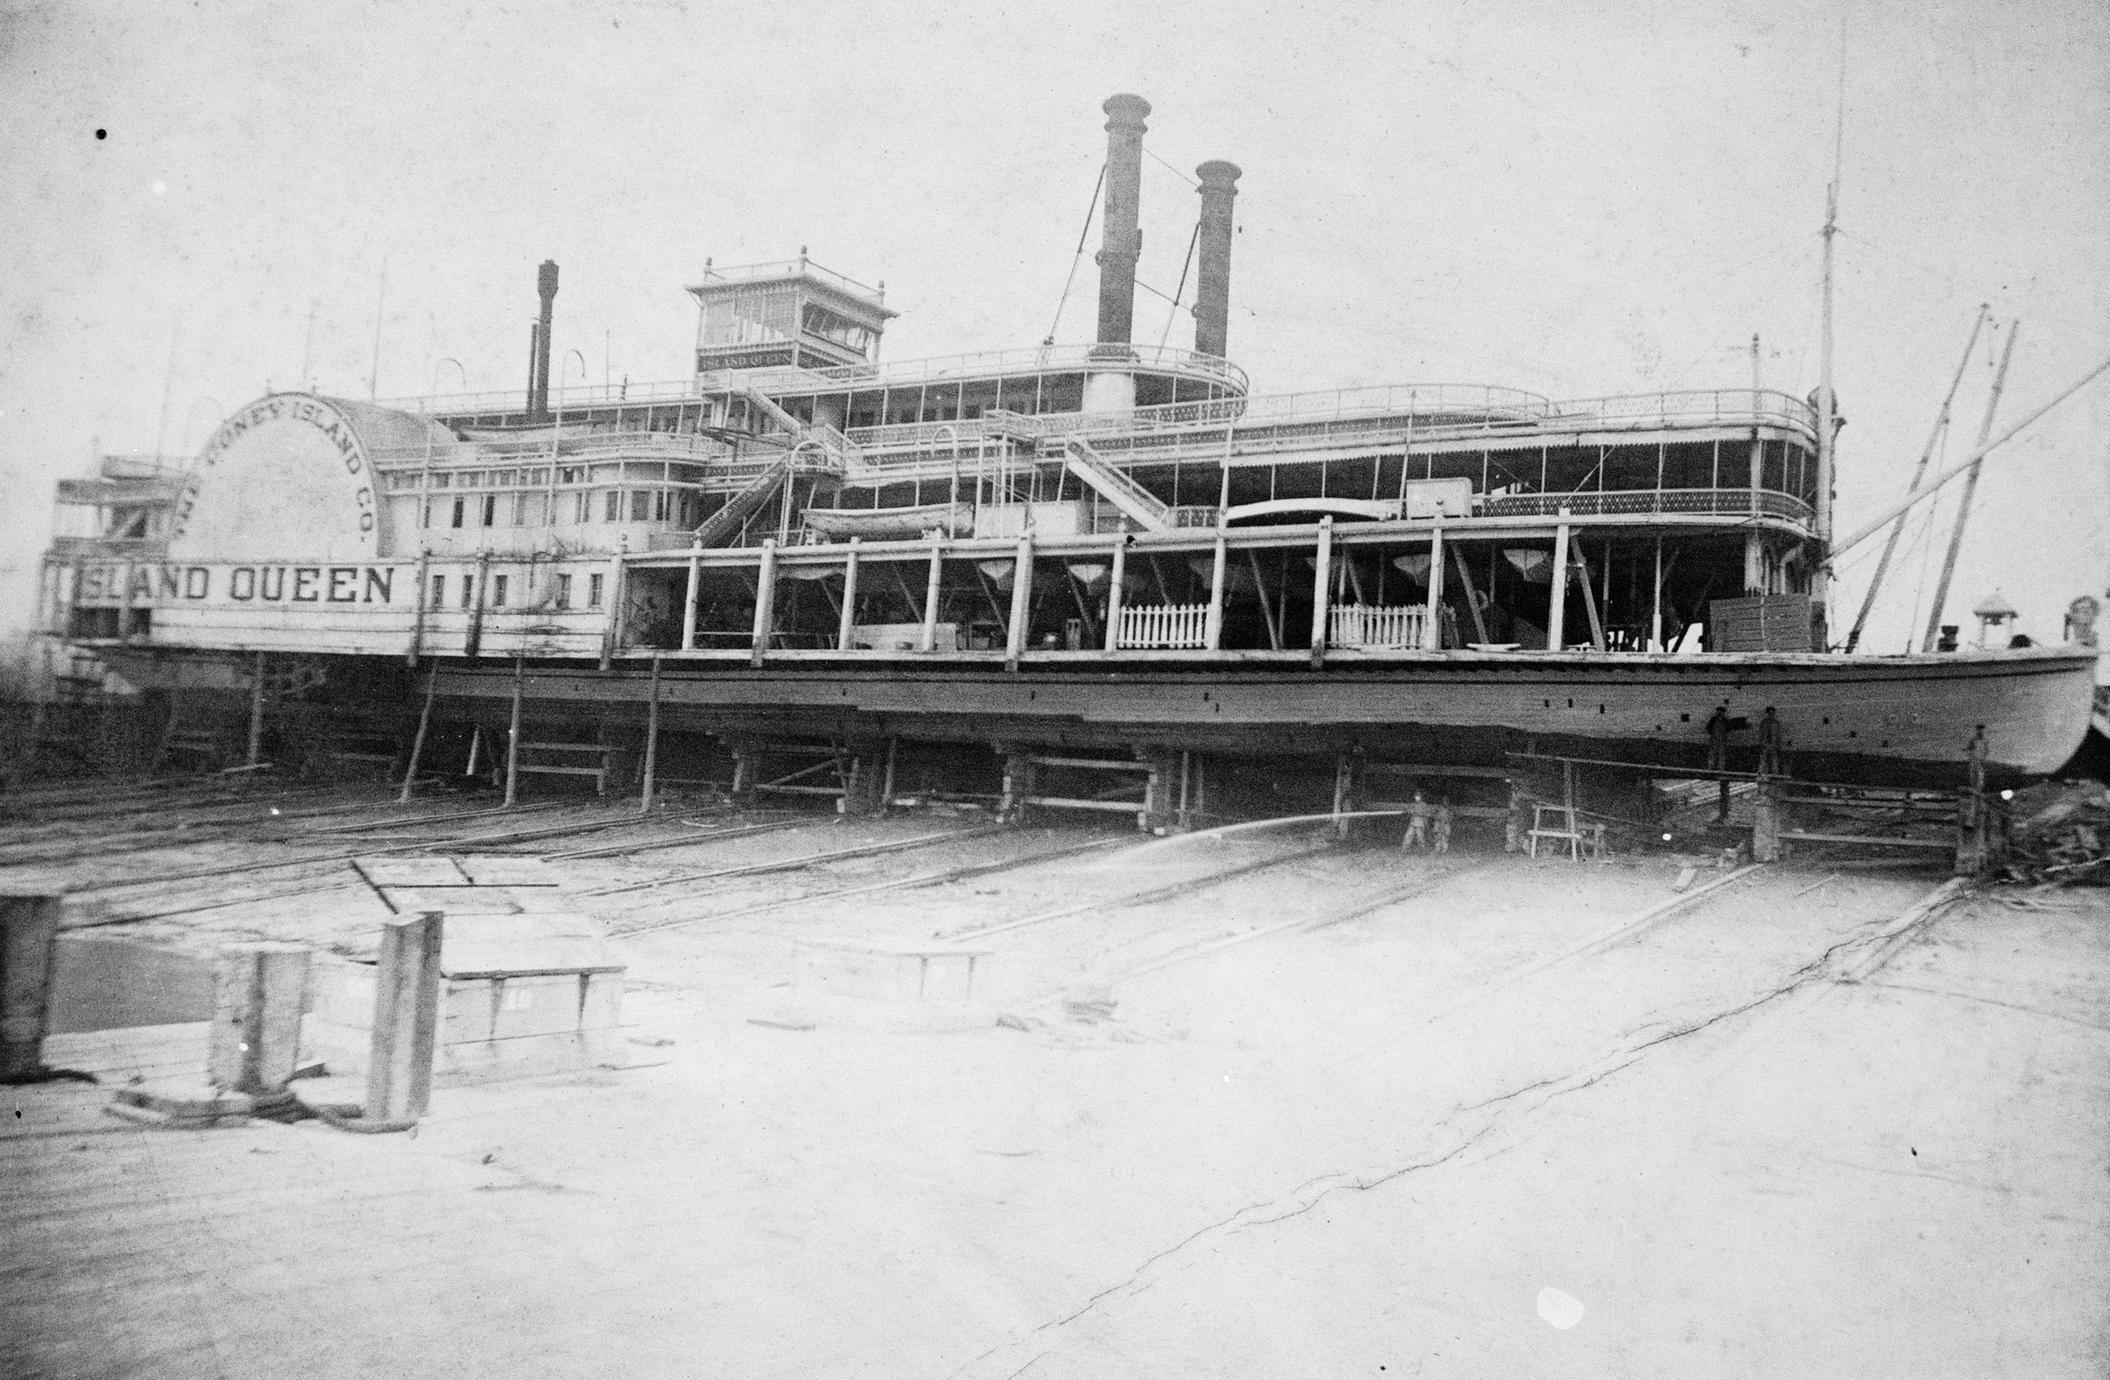 Island Queen (Excursion boat, 1896-1922)